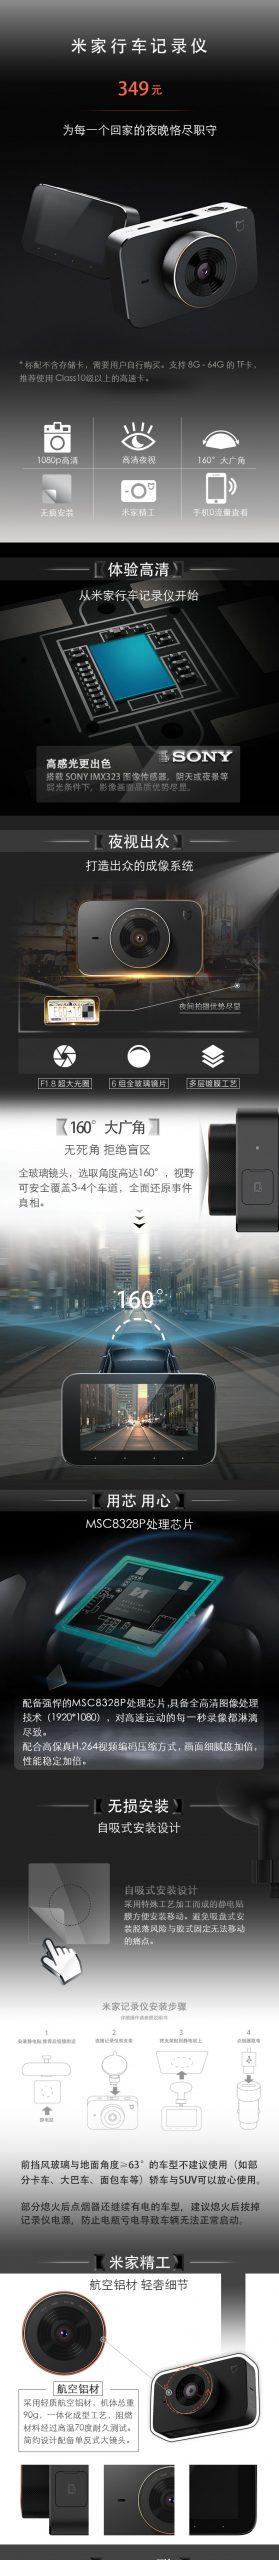 camera hanh trinh oto xiaomi 2017 8 scaled